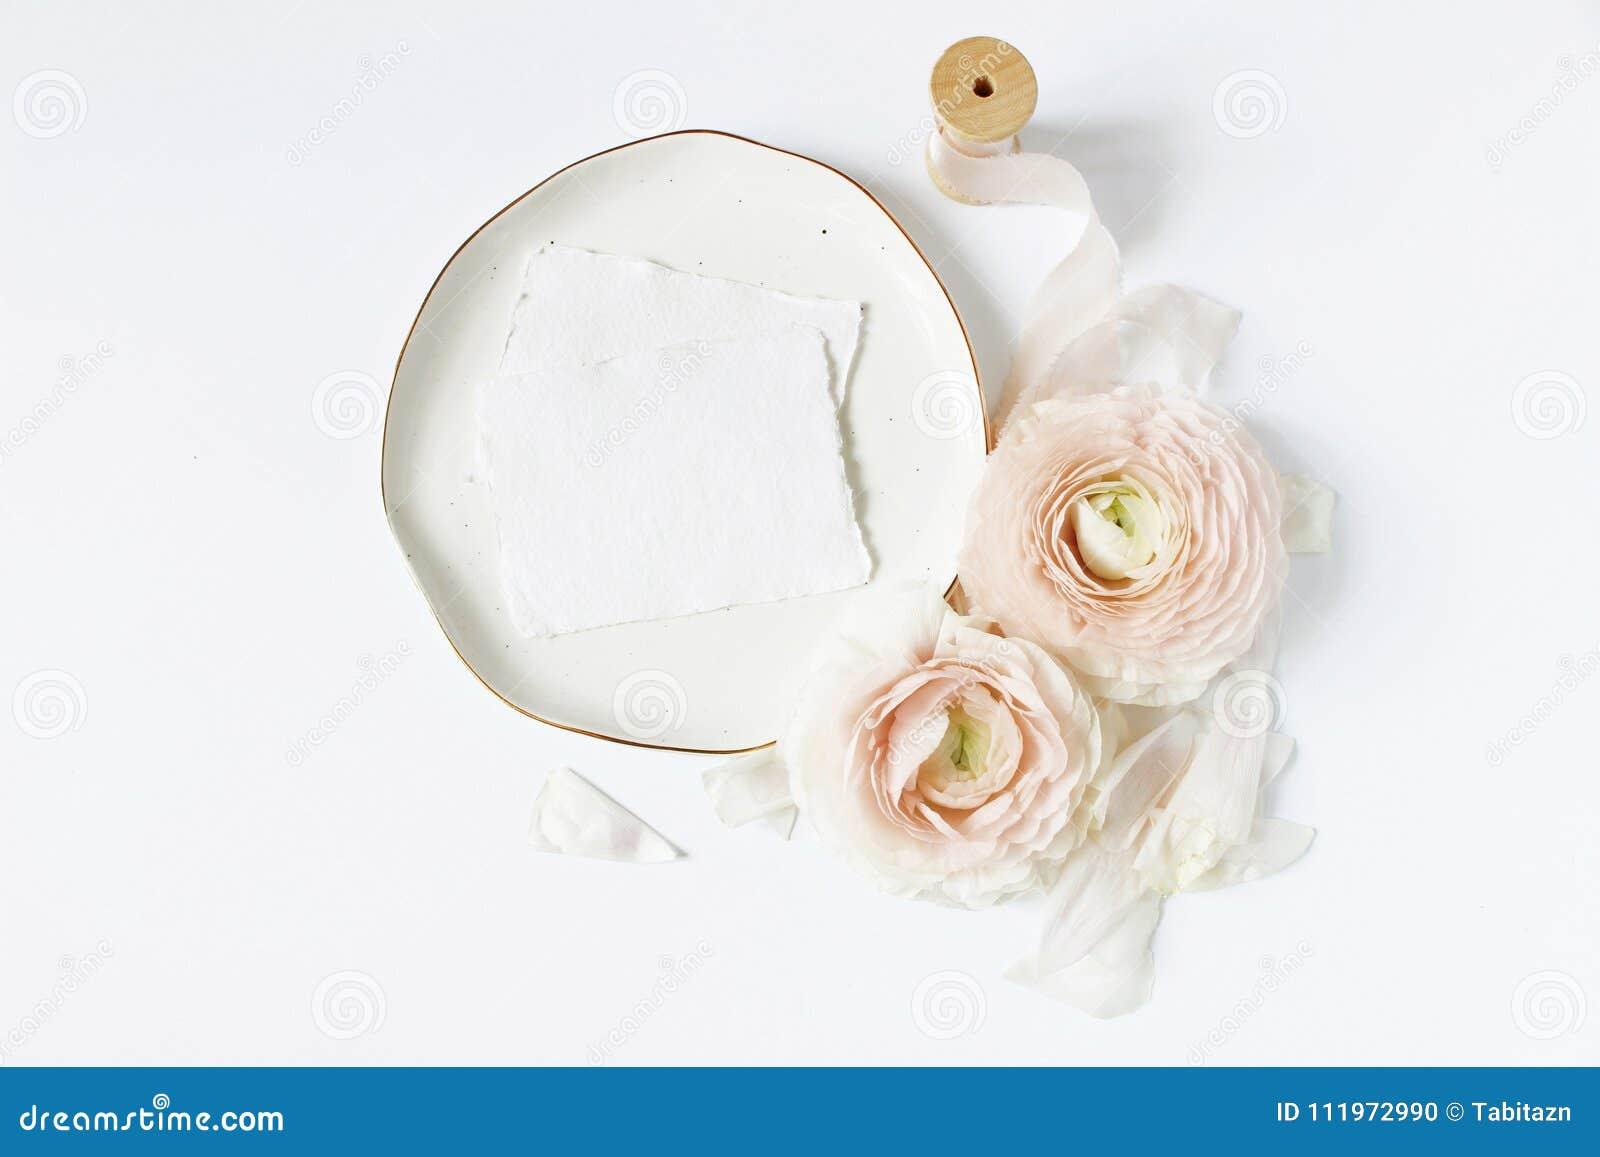 Feminine wedding, birthday desktop mock-up scene. Porcelain plate, blank craft paper greeting cards, silk ribbon, blush